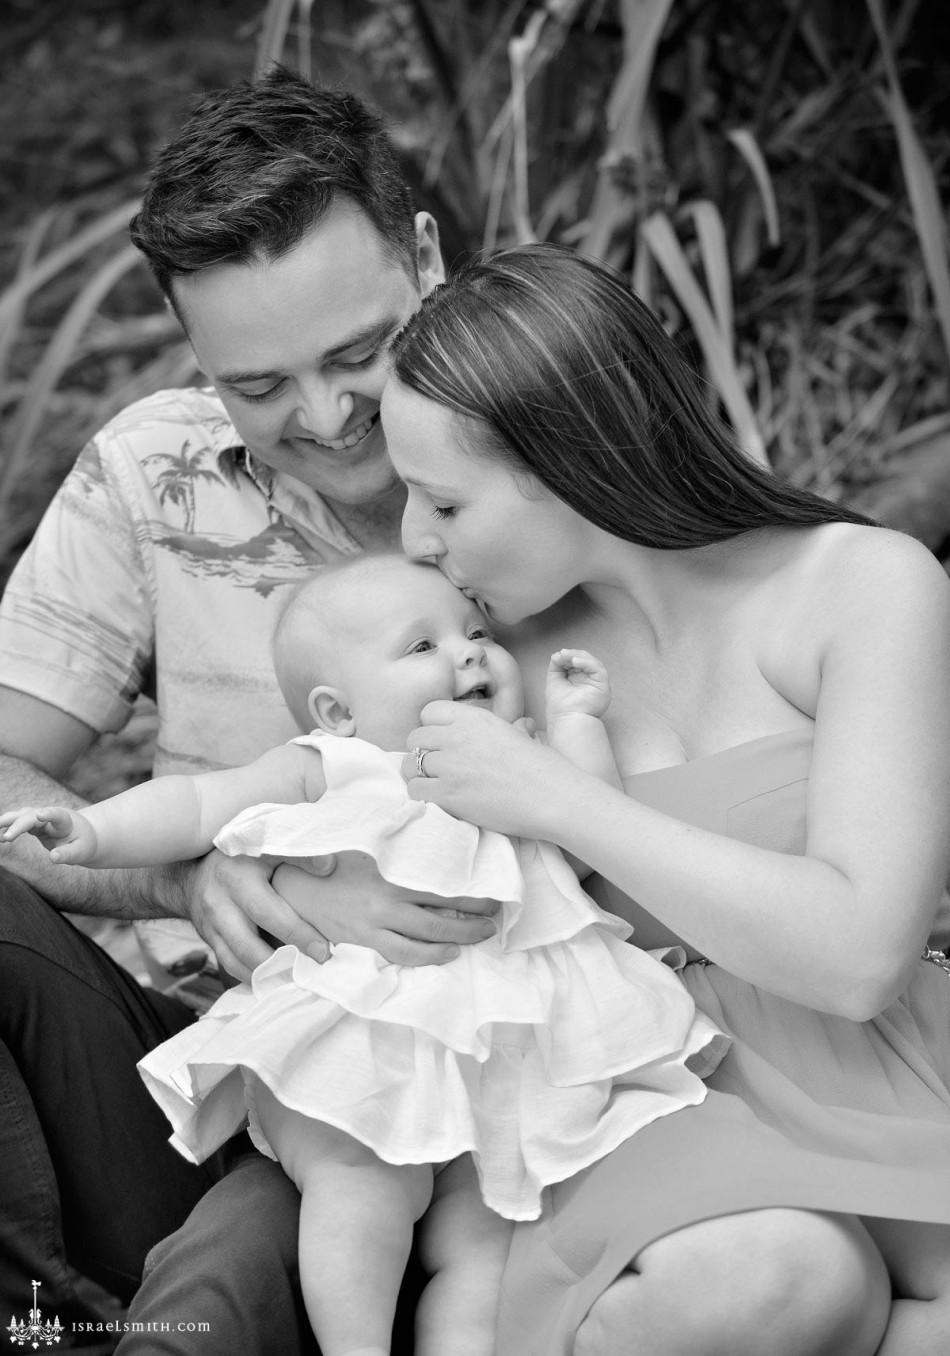 Israel-Smith-Family-Portraits-Angela_Chad_0026